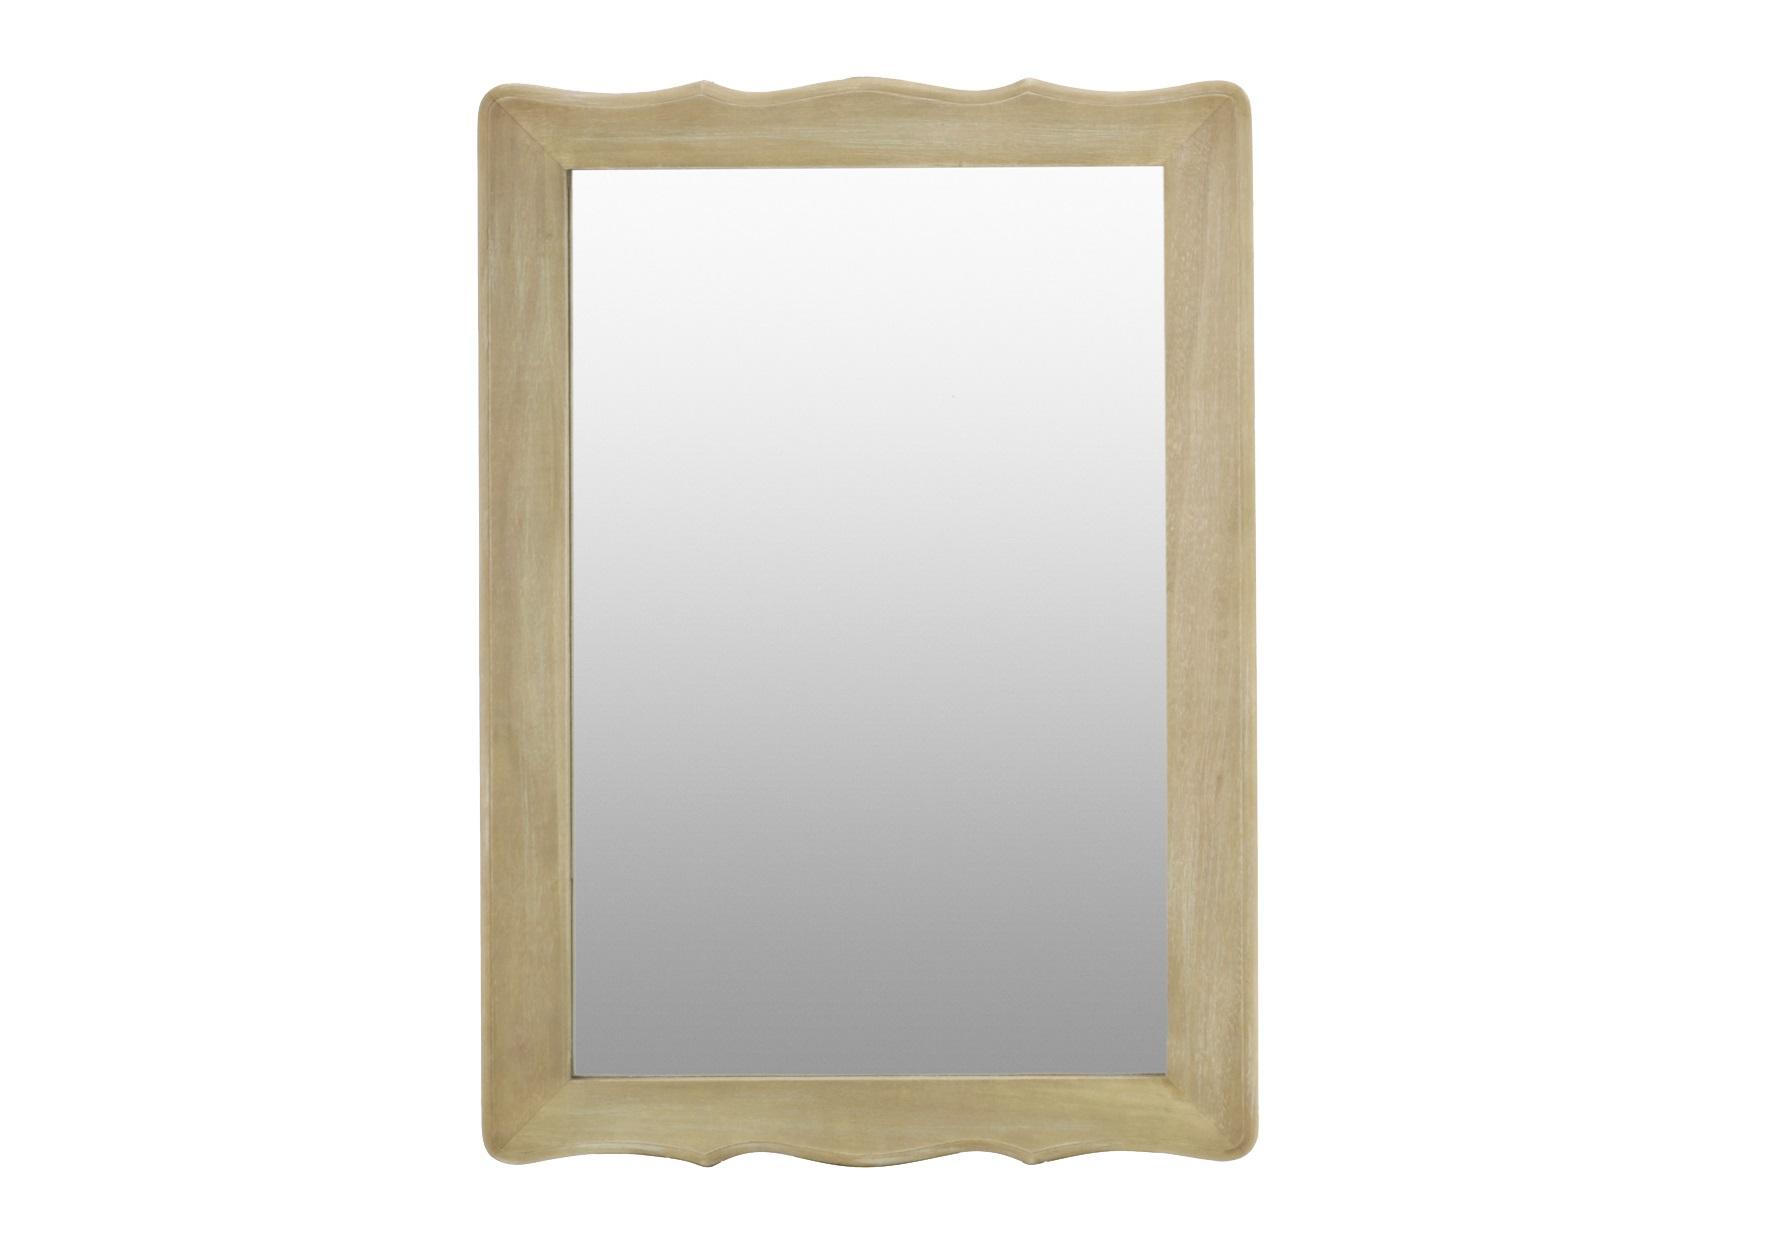 Зеркало  FallersНастенные зеркала<br>Зеркало<br><br>Material: Дерево<br>Width см: 50<br>Depth см: 2<br>Height см: 70